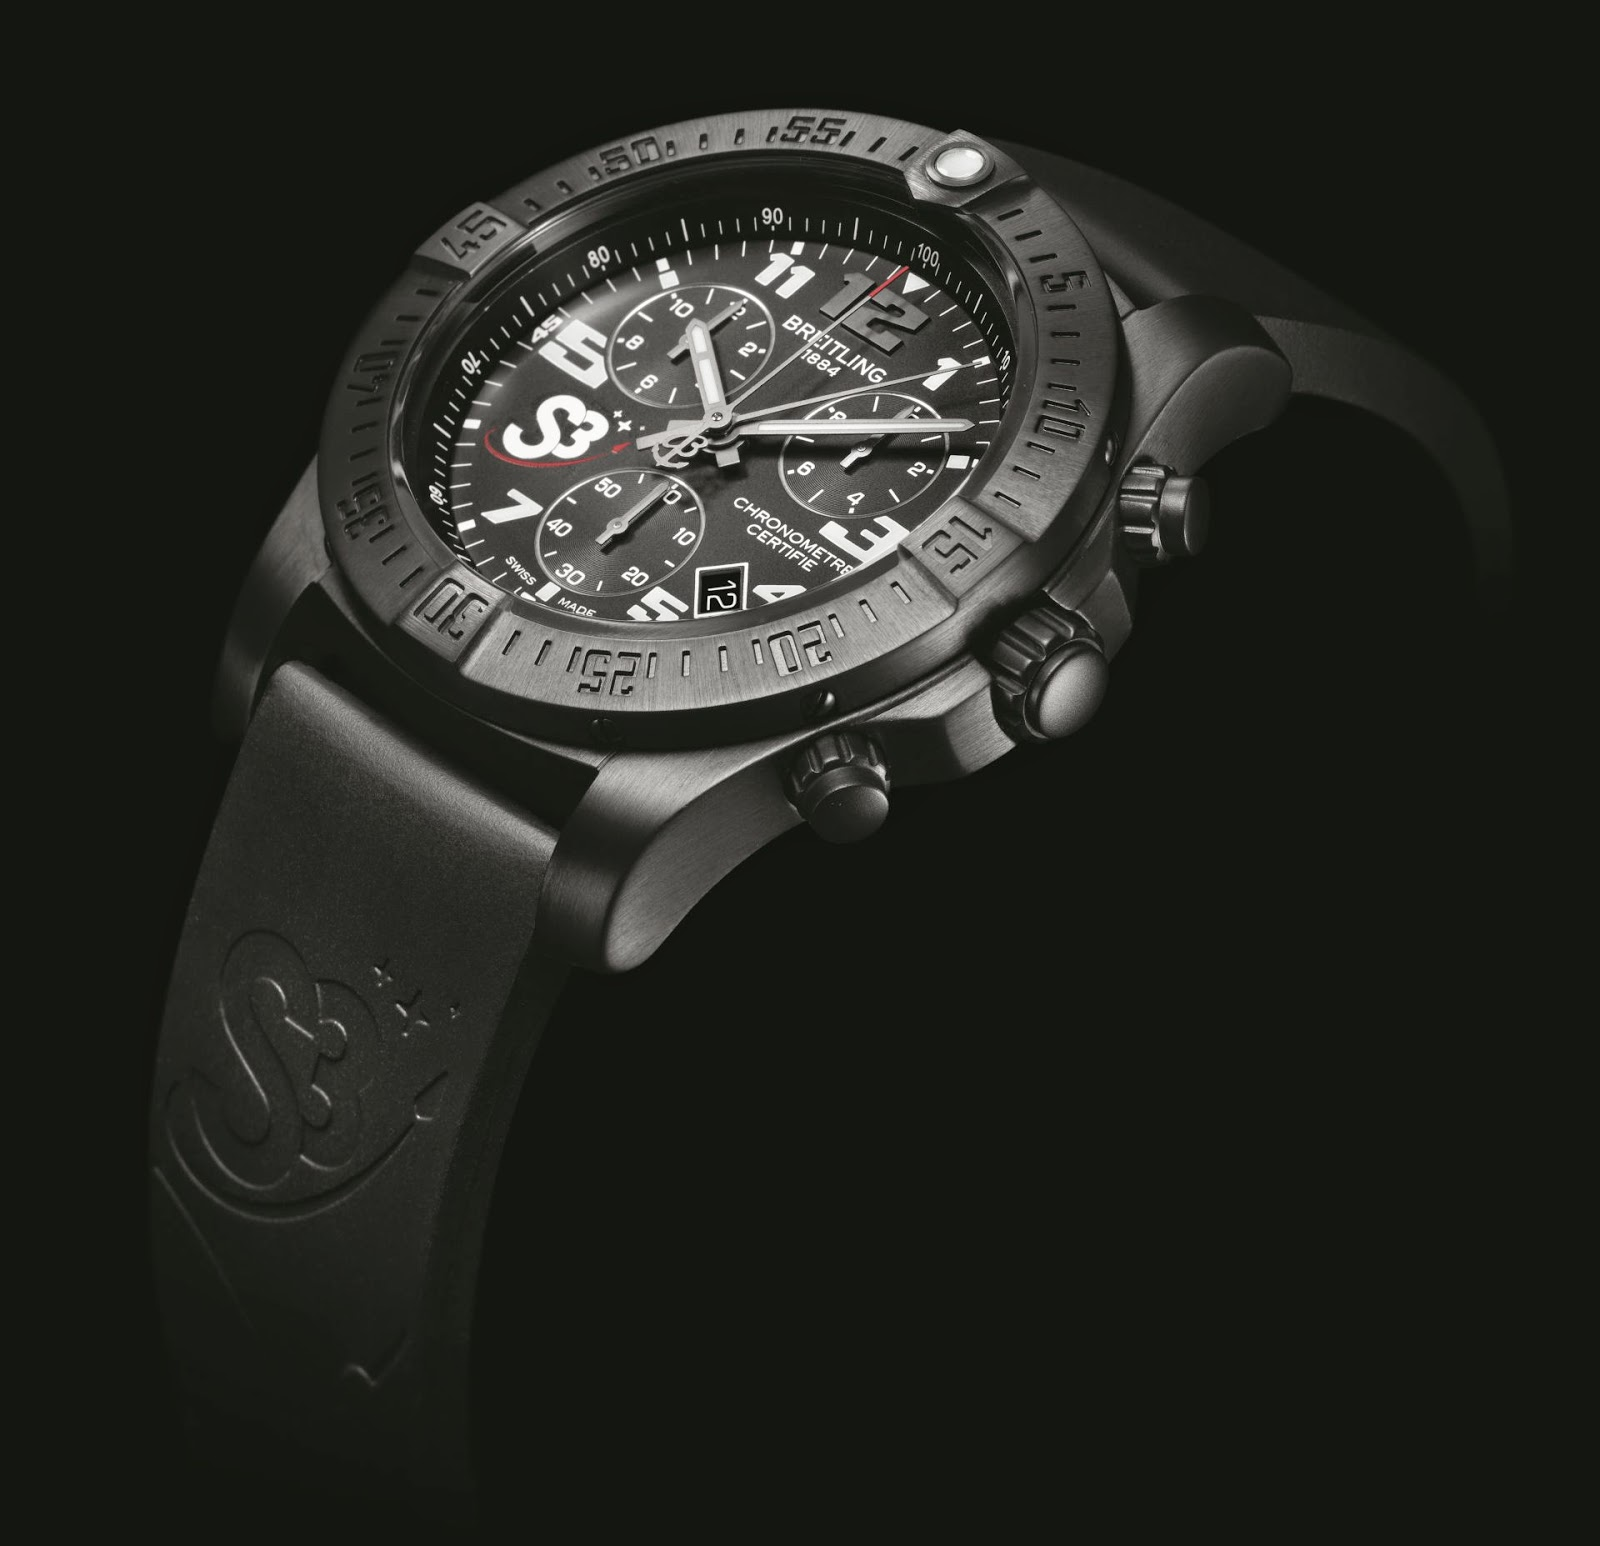 Breitling S3 ZeroG Chronograph